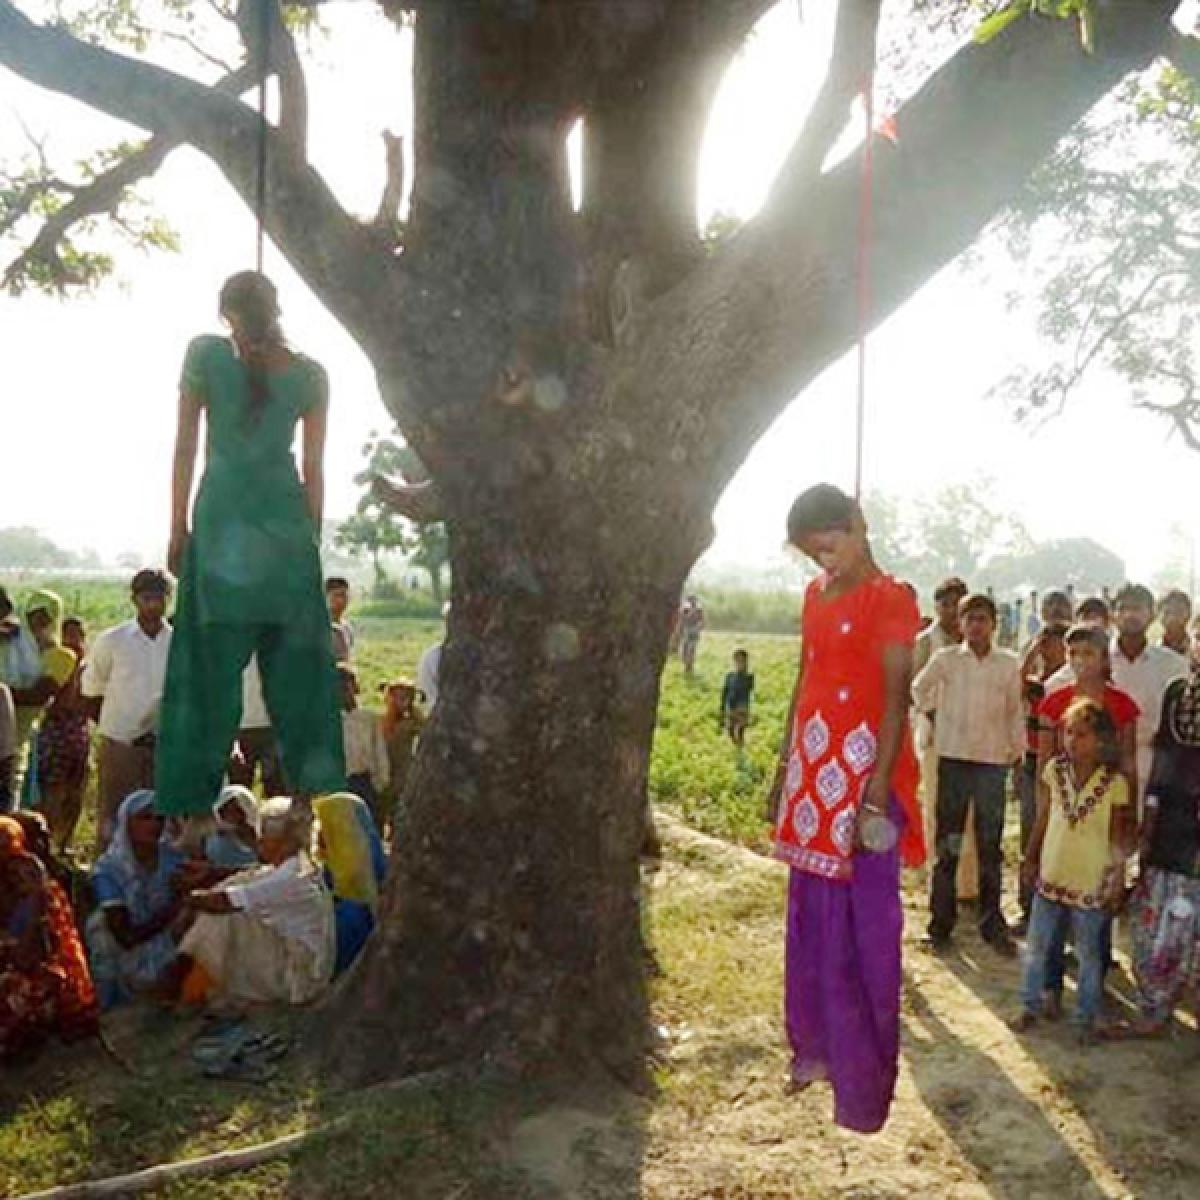 CBI to exhume bodies of two Badaun rape victims